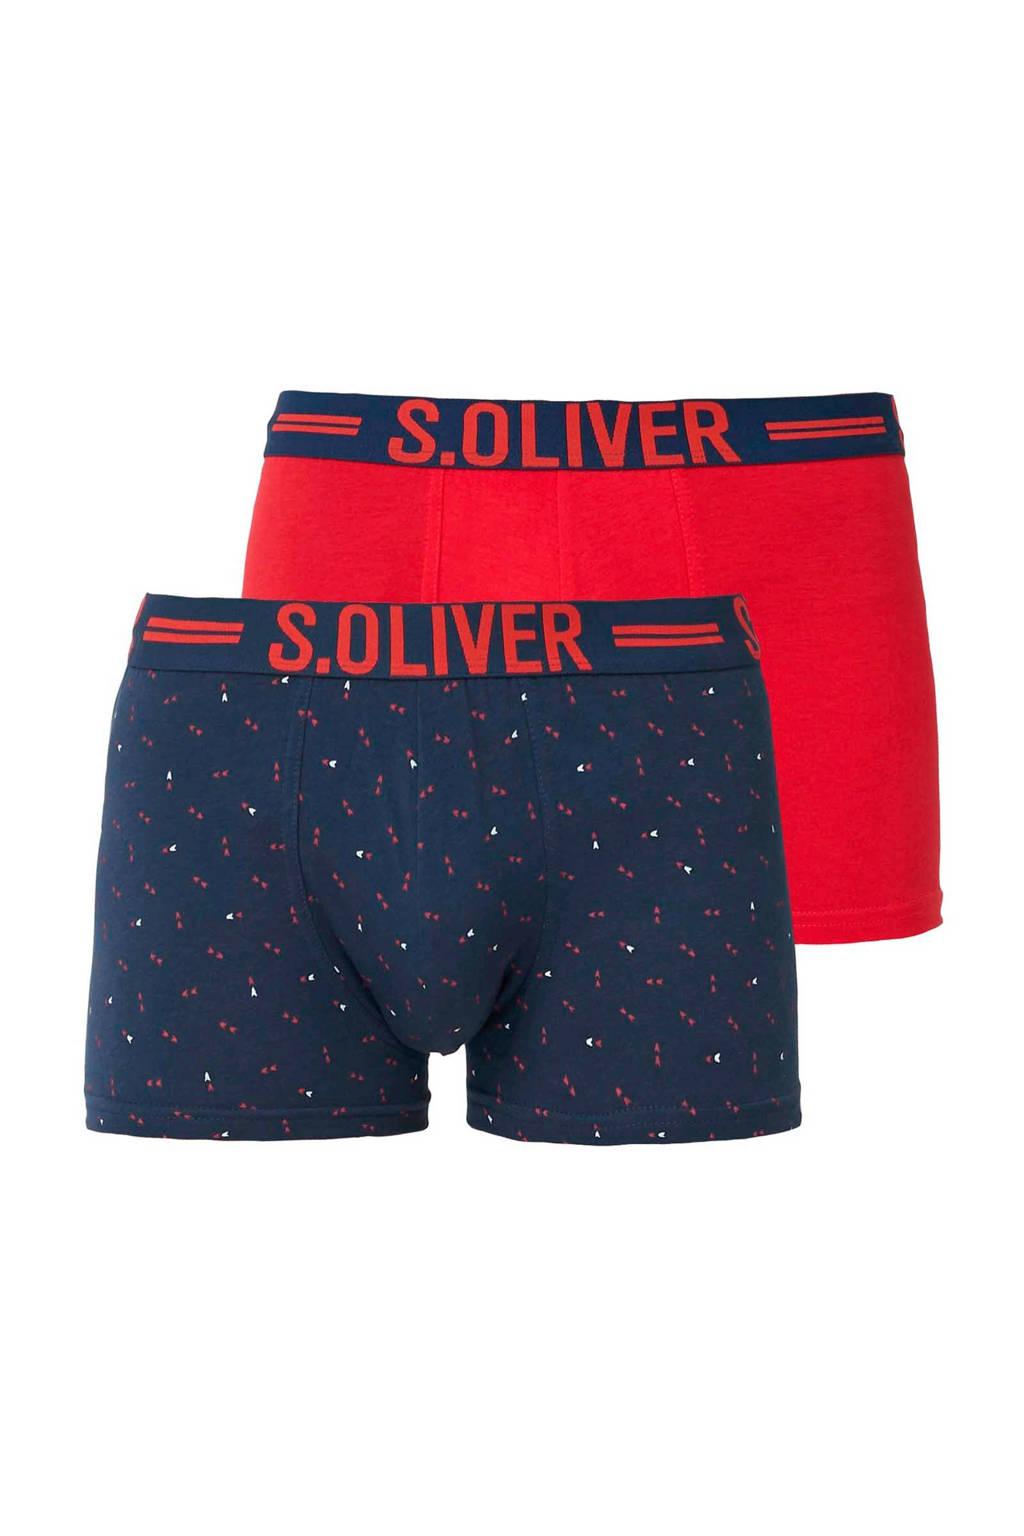 s.Oliver boxershort (set van 2), Marine/rood